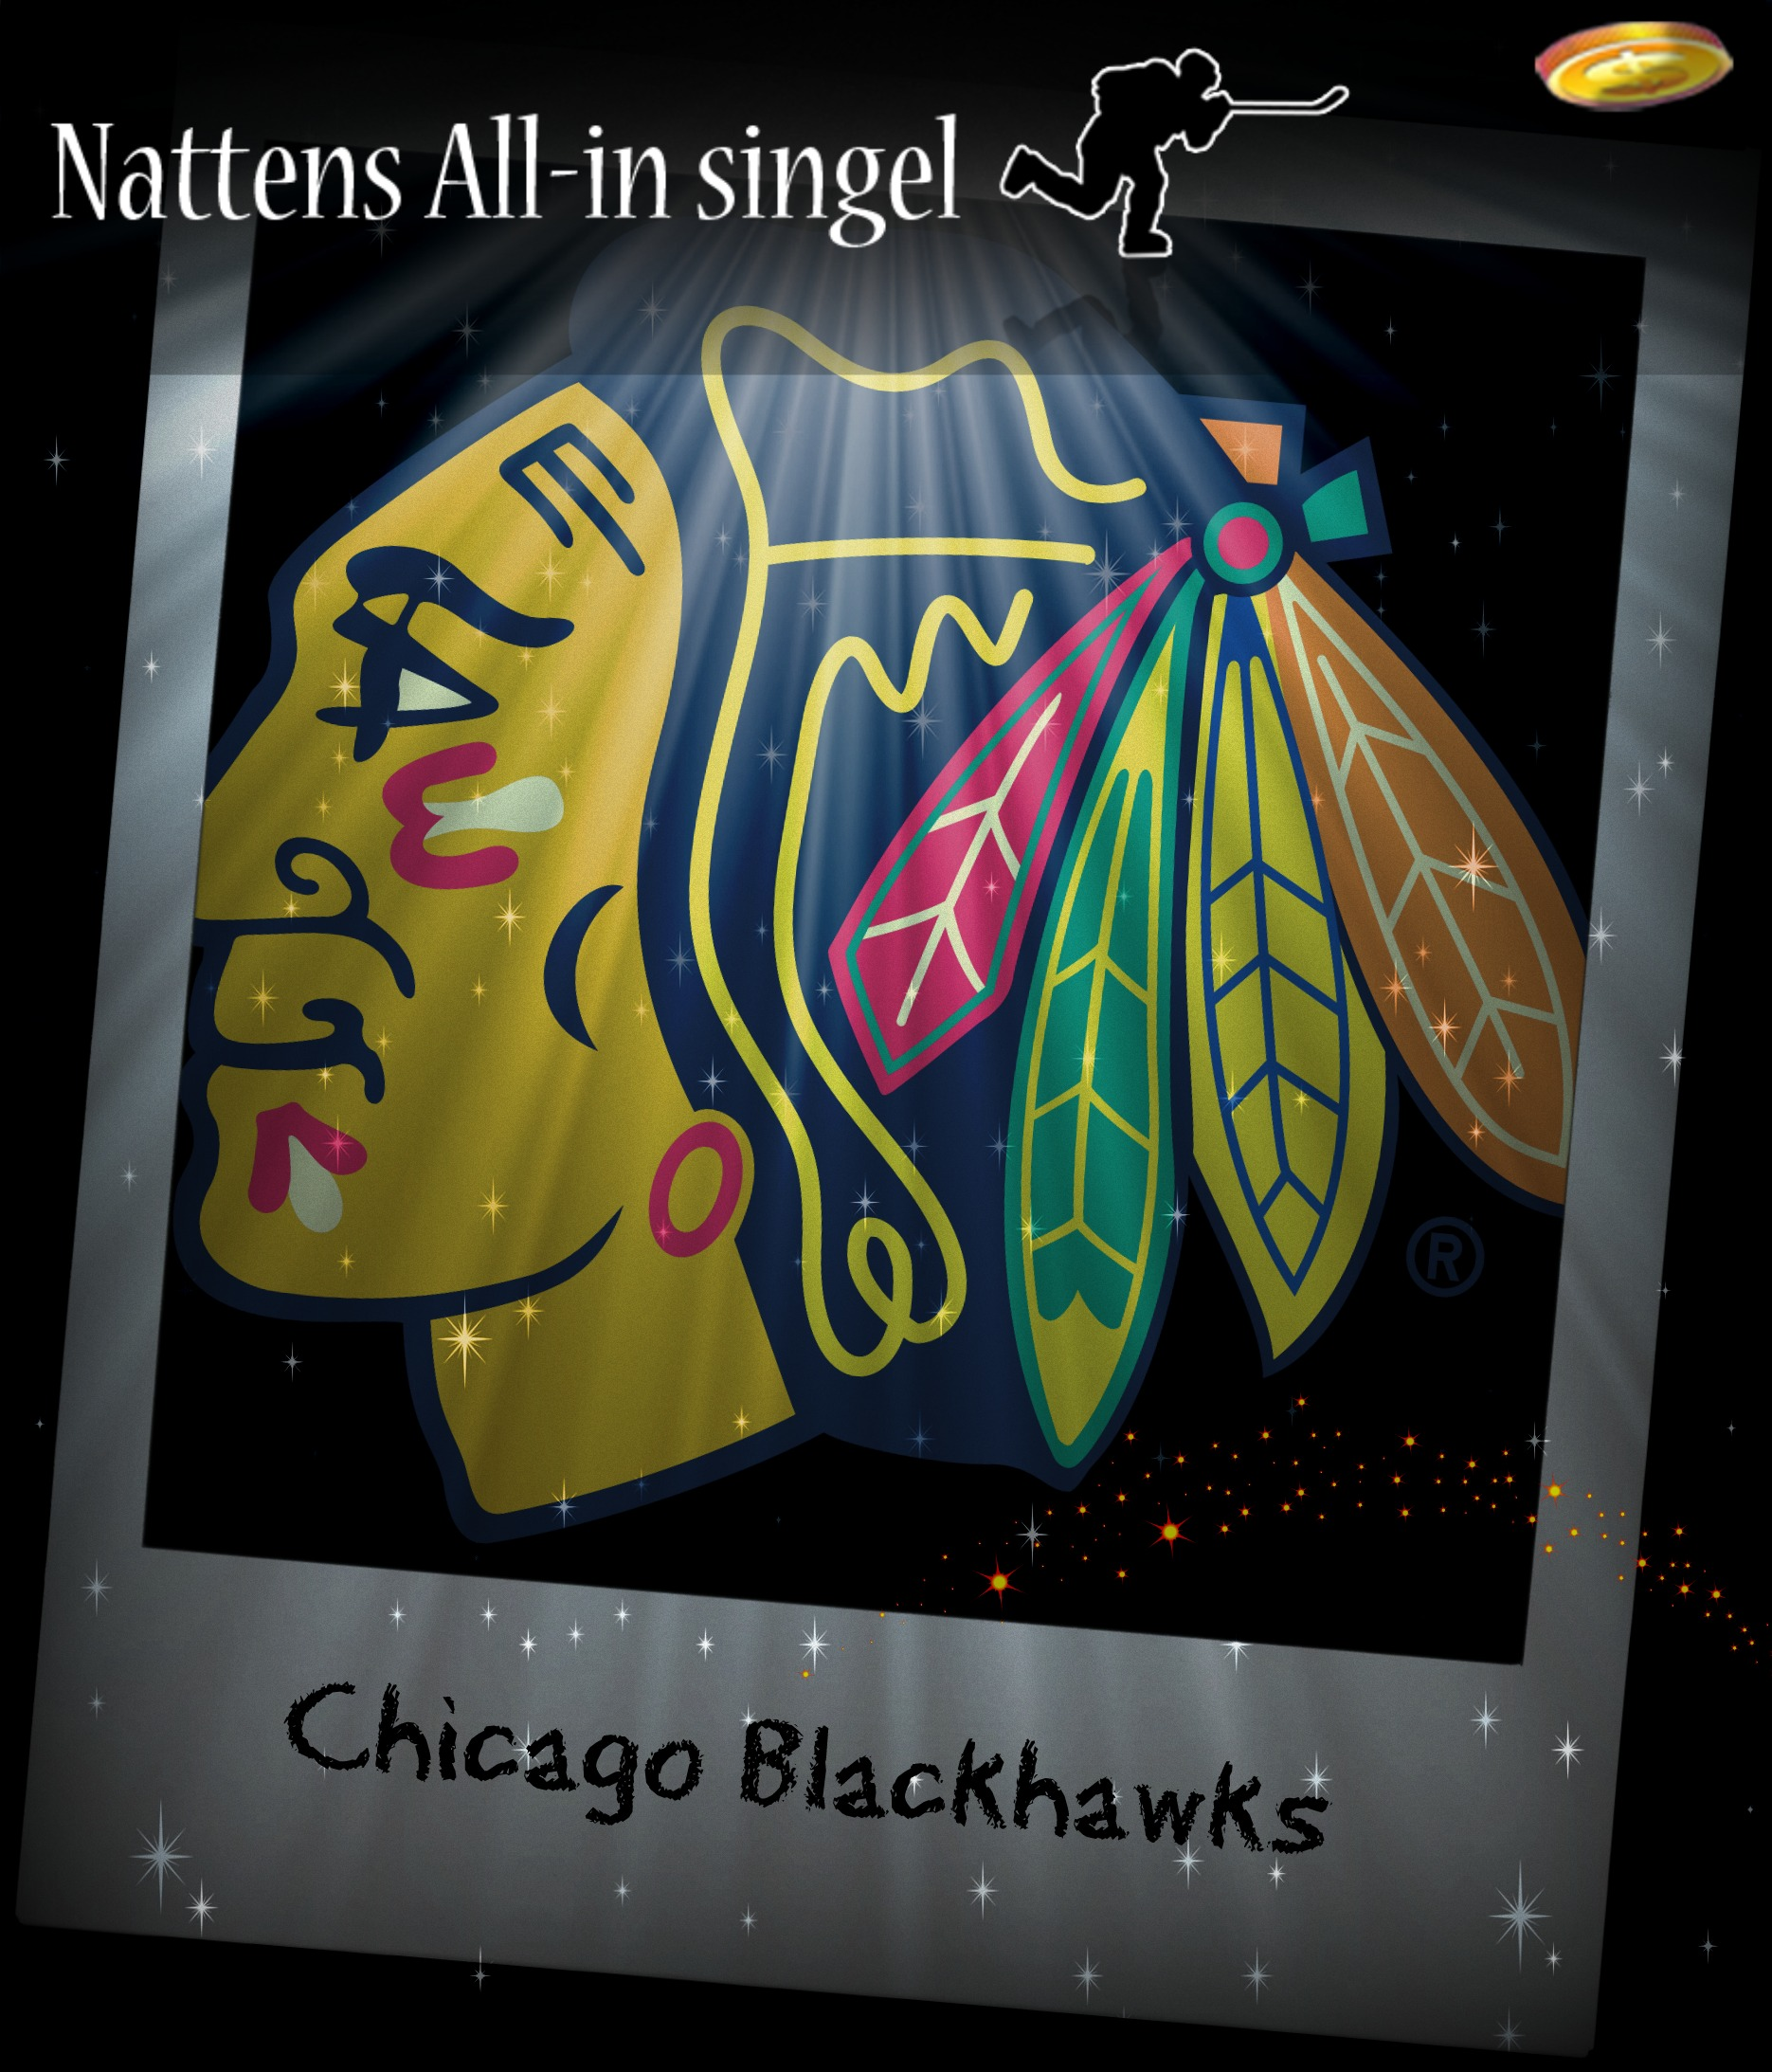 NHL-matcher 26-27/10-2013